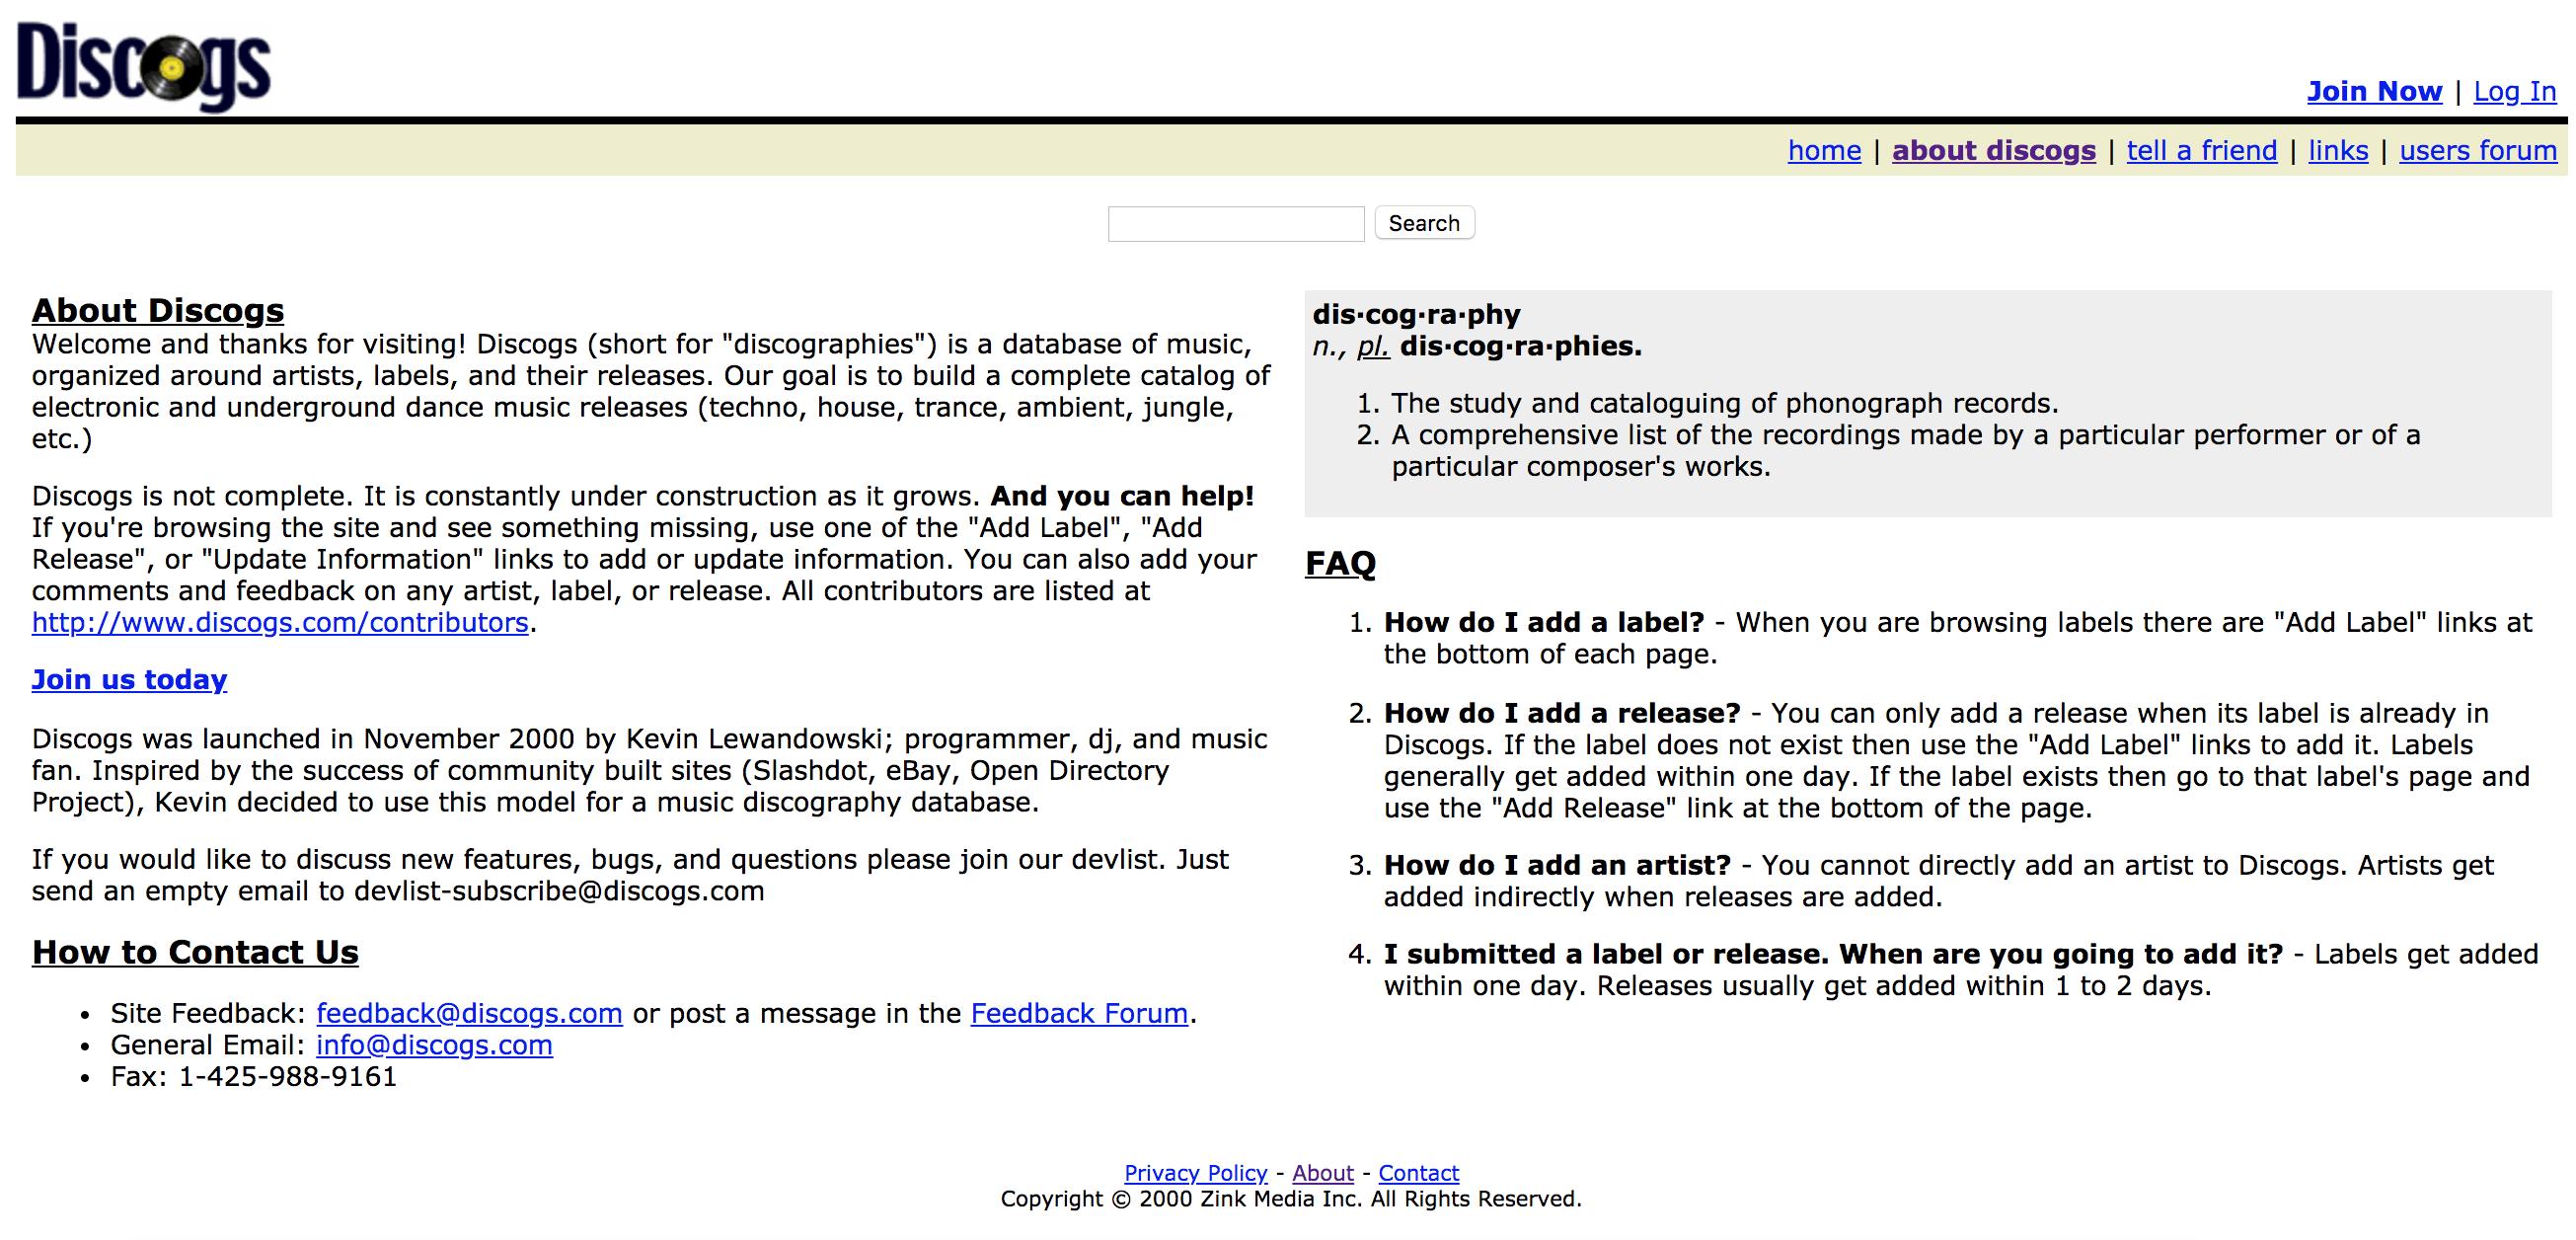 screenshot of discogs homepage circa 2001